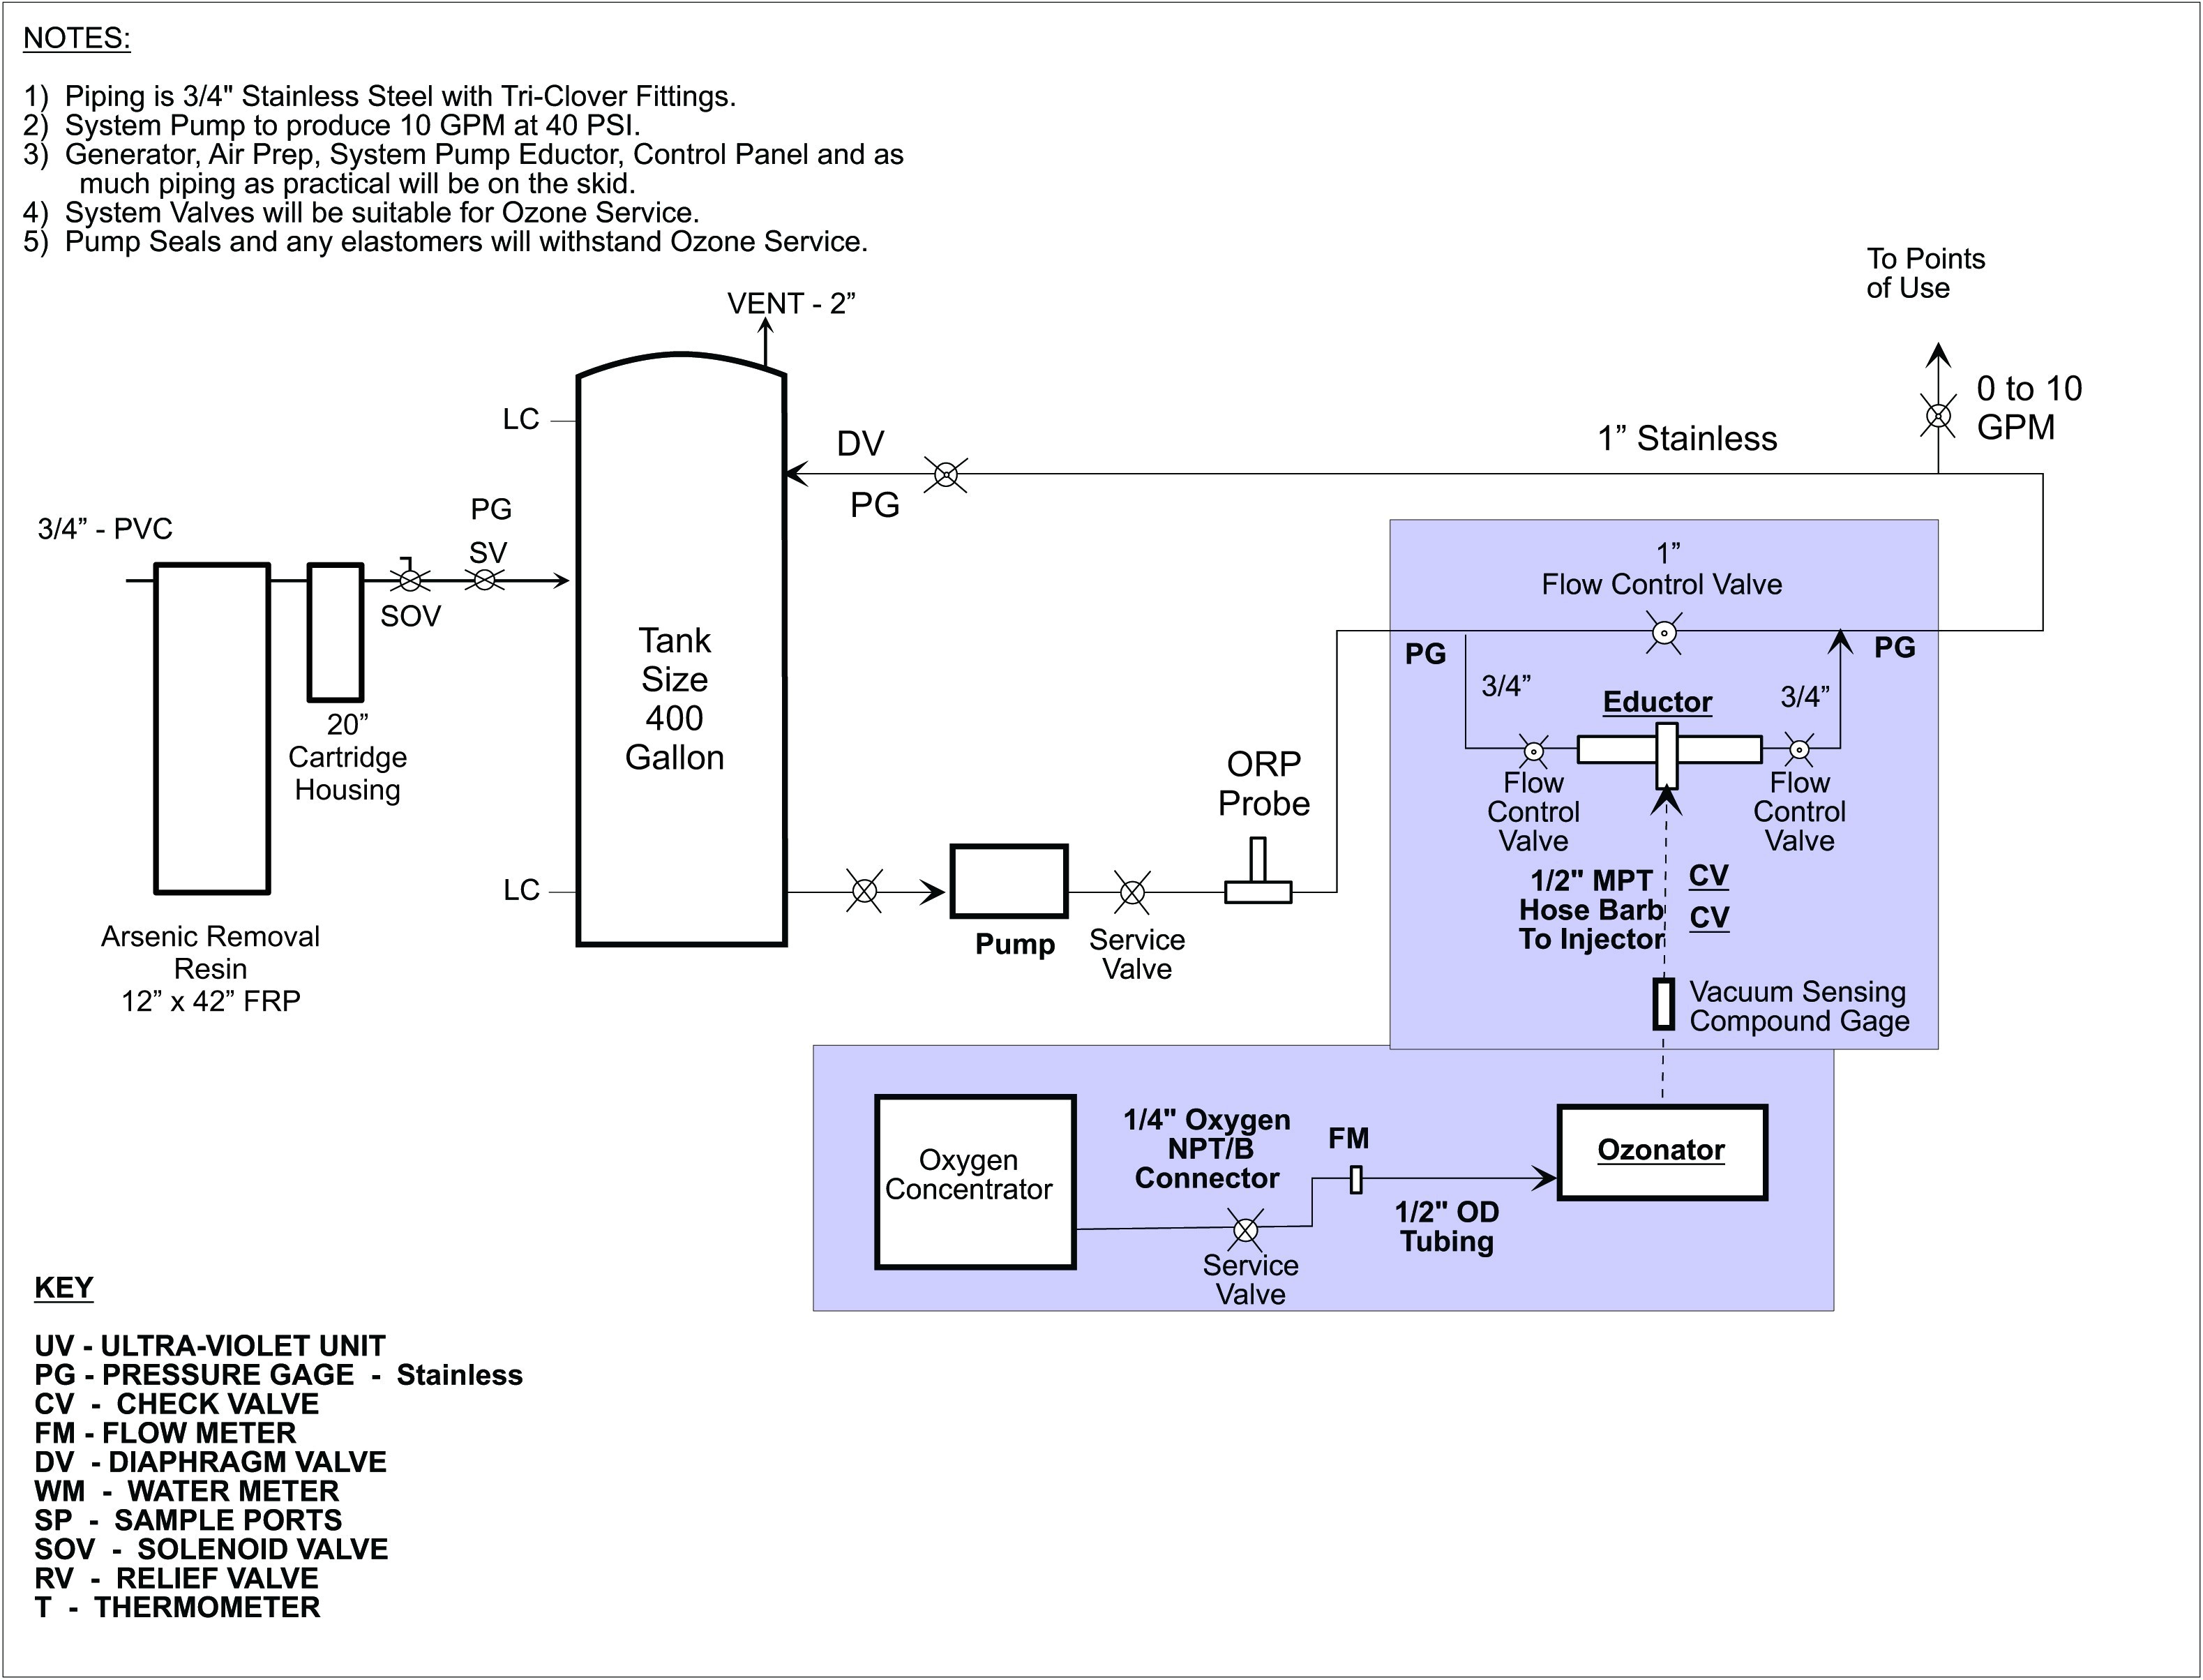 rule mate 1500 wiring diagram luxury pump down refrigeration system wiring diagram zookastar